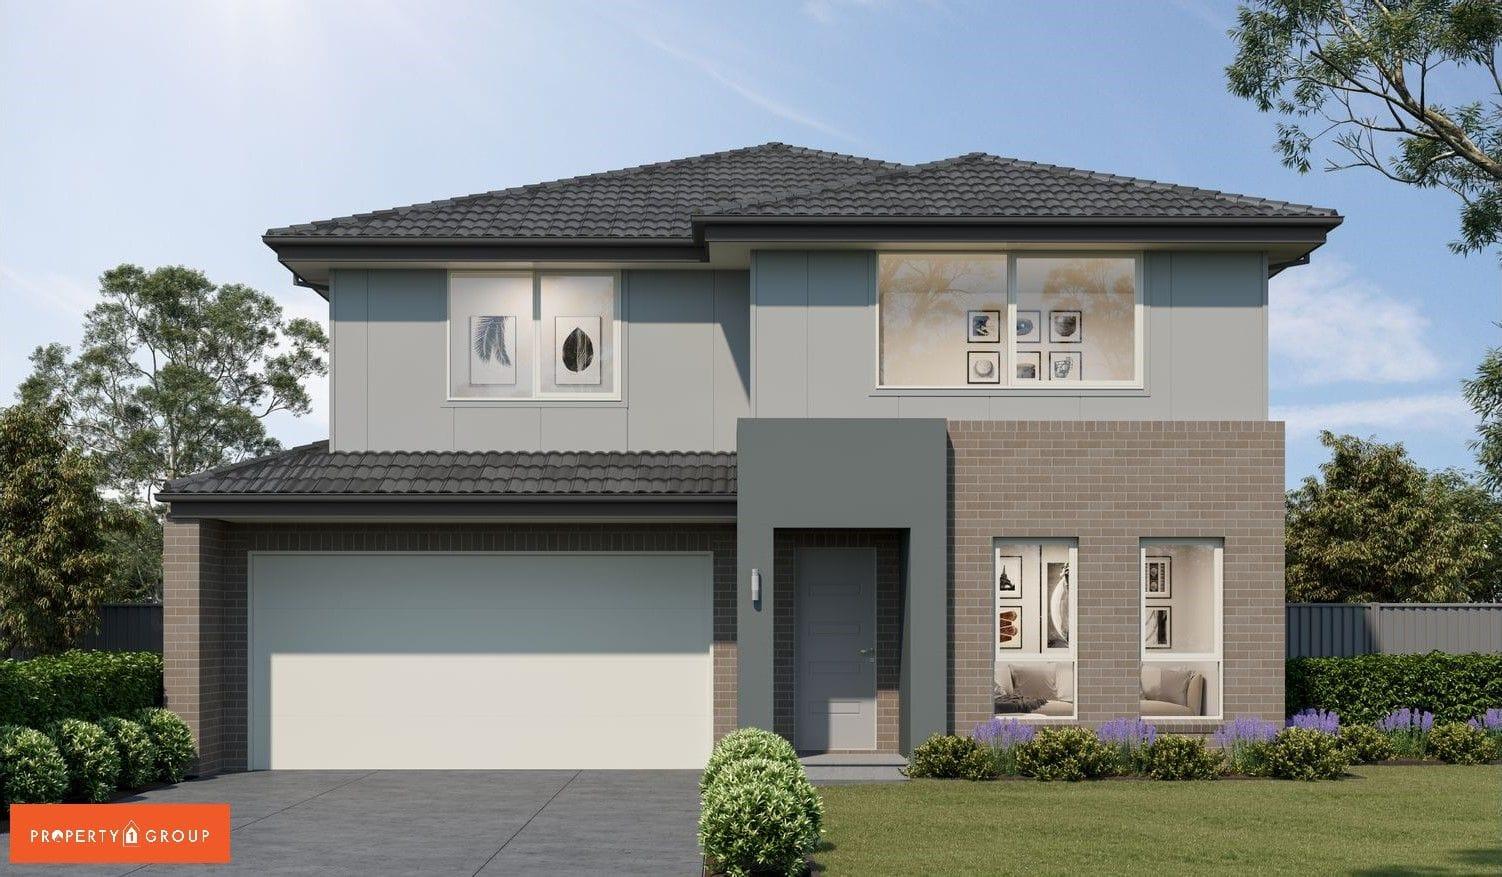 Property Lot 19, 47 Carney Crescent, SCHOFIELDS NSW 2762 main IMAGE